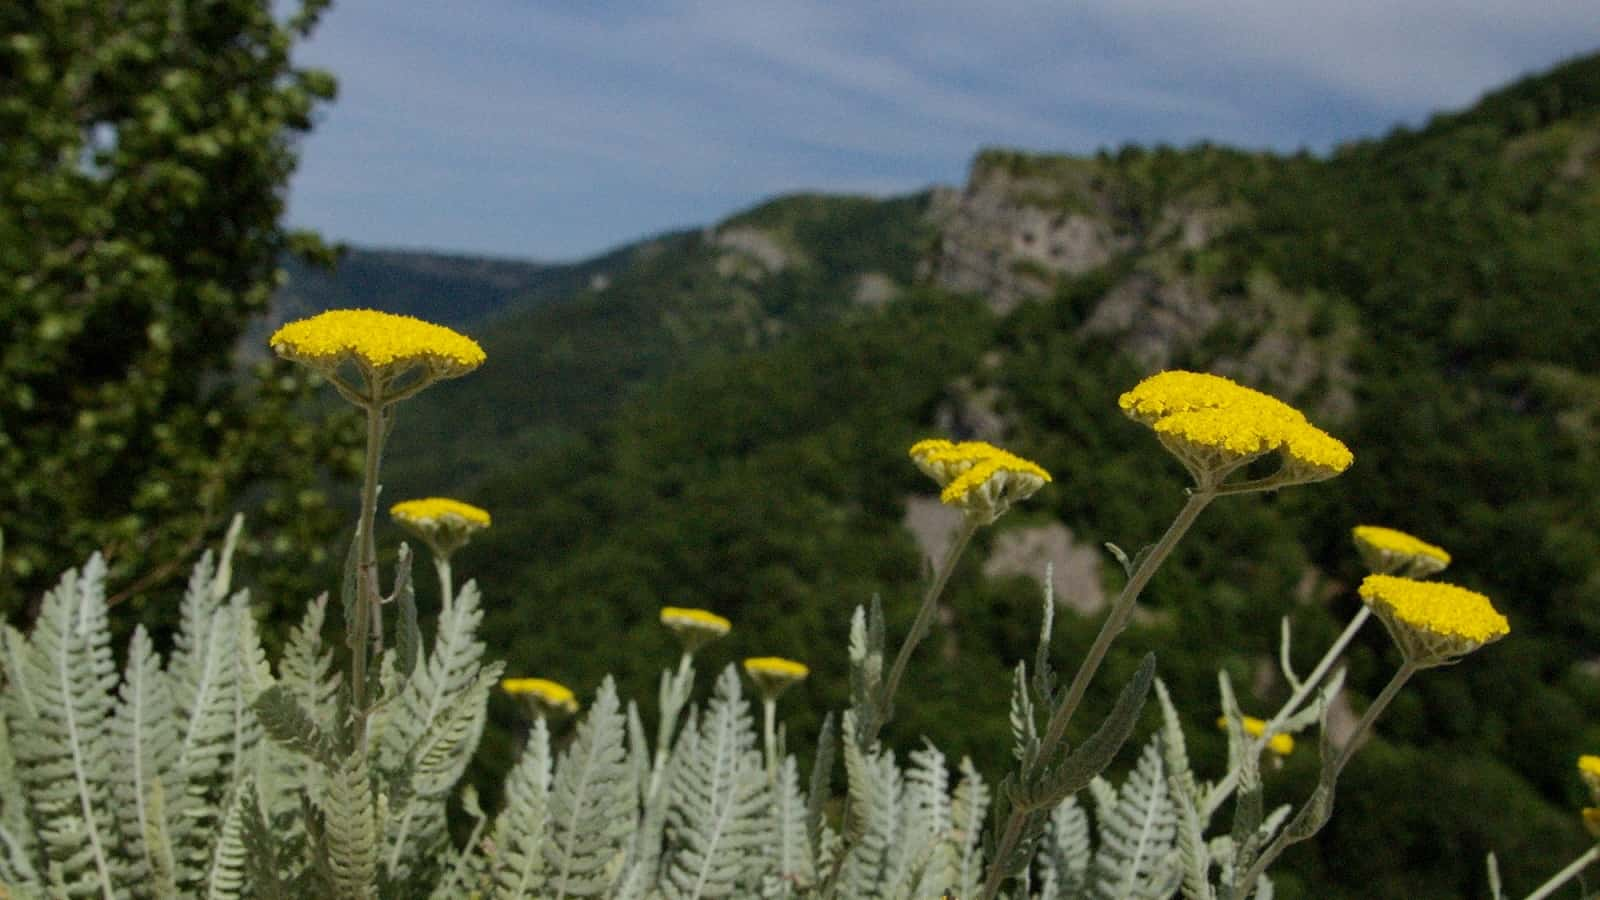 Schafgarbe Achillea clypeolata, endemisch auf der Balkanhalbinsel - Foto: Naturpark Vachranski Balkan/Krasimir Lakovski